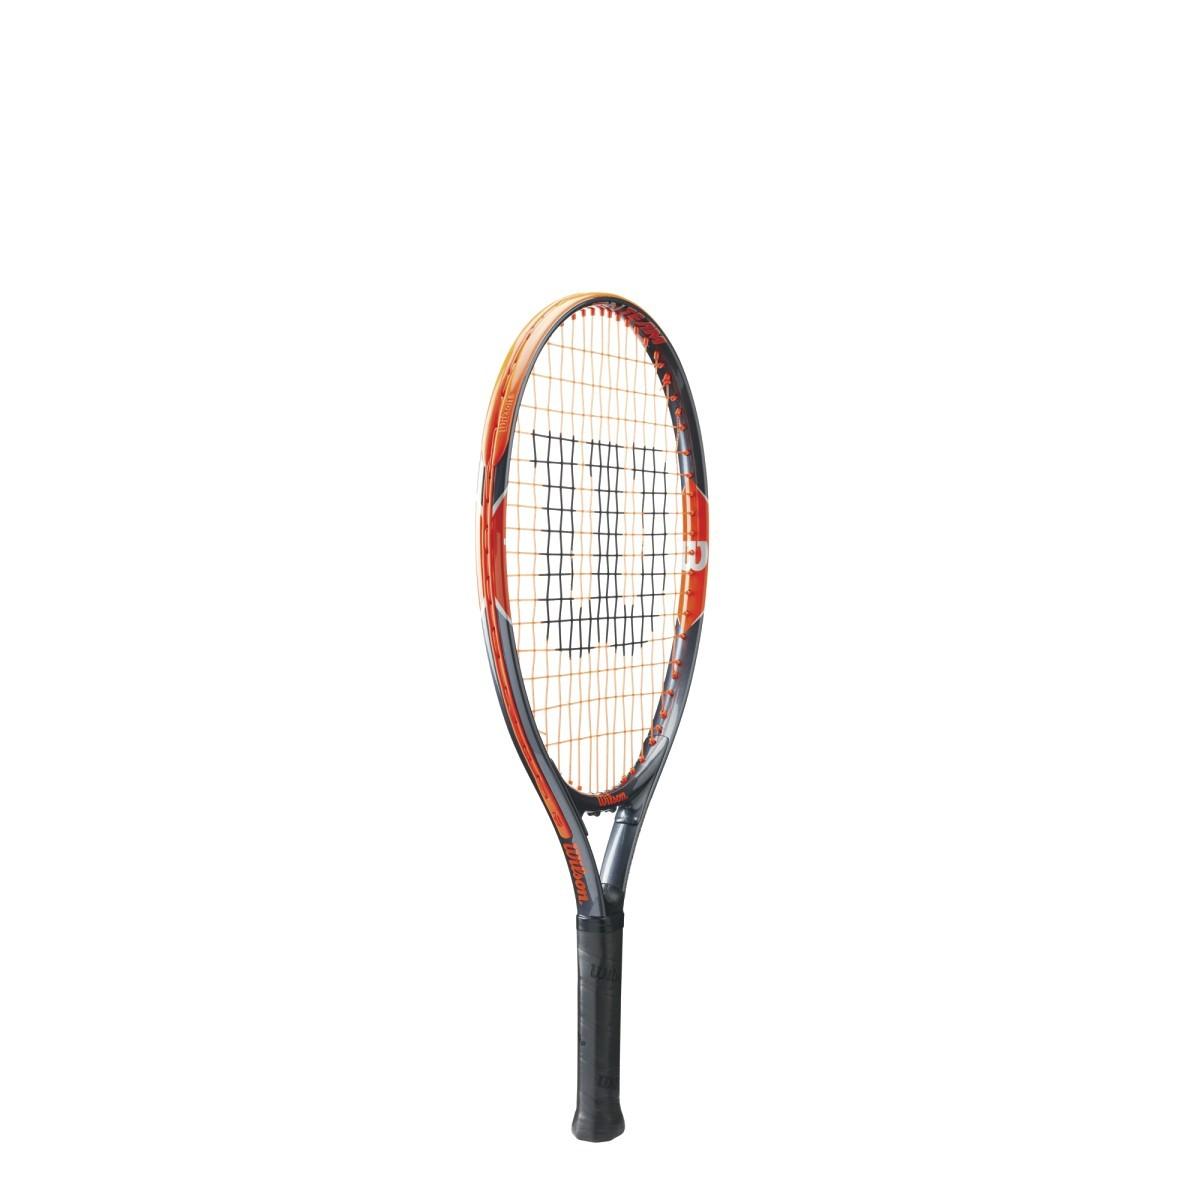 1200x1200 Burn Team 21 Tennis Racket Wilson Sporting Goods